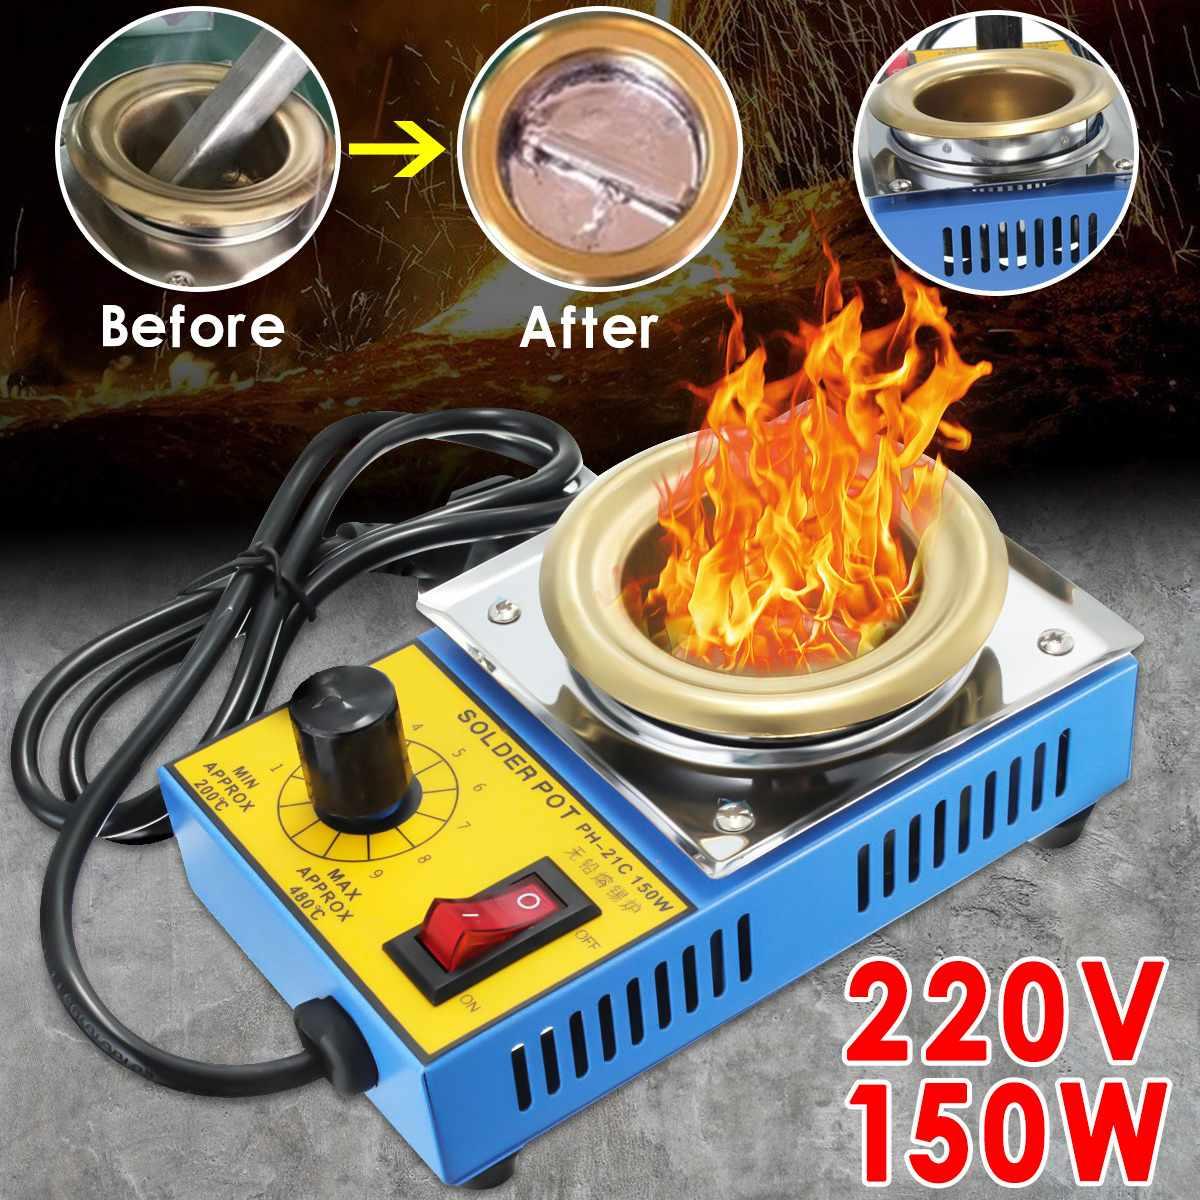 NEW 220V 150W 50mm Soldering Desoldering Stainless Steel Plate Solder Pot Desoldering Bath 200-480°C